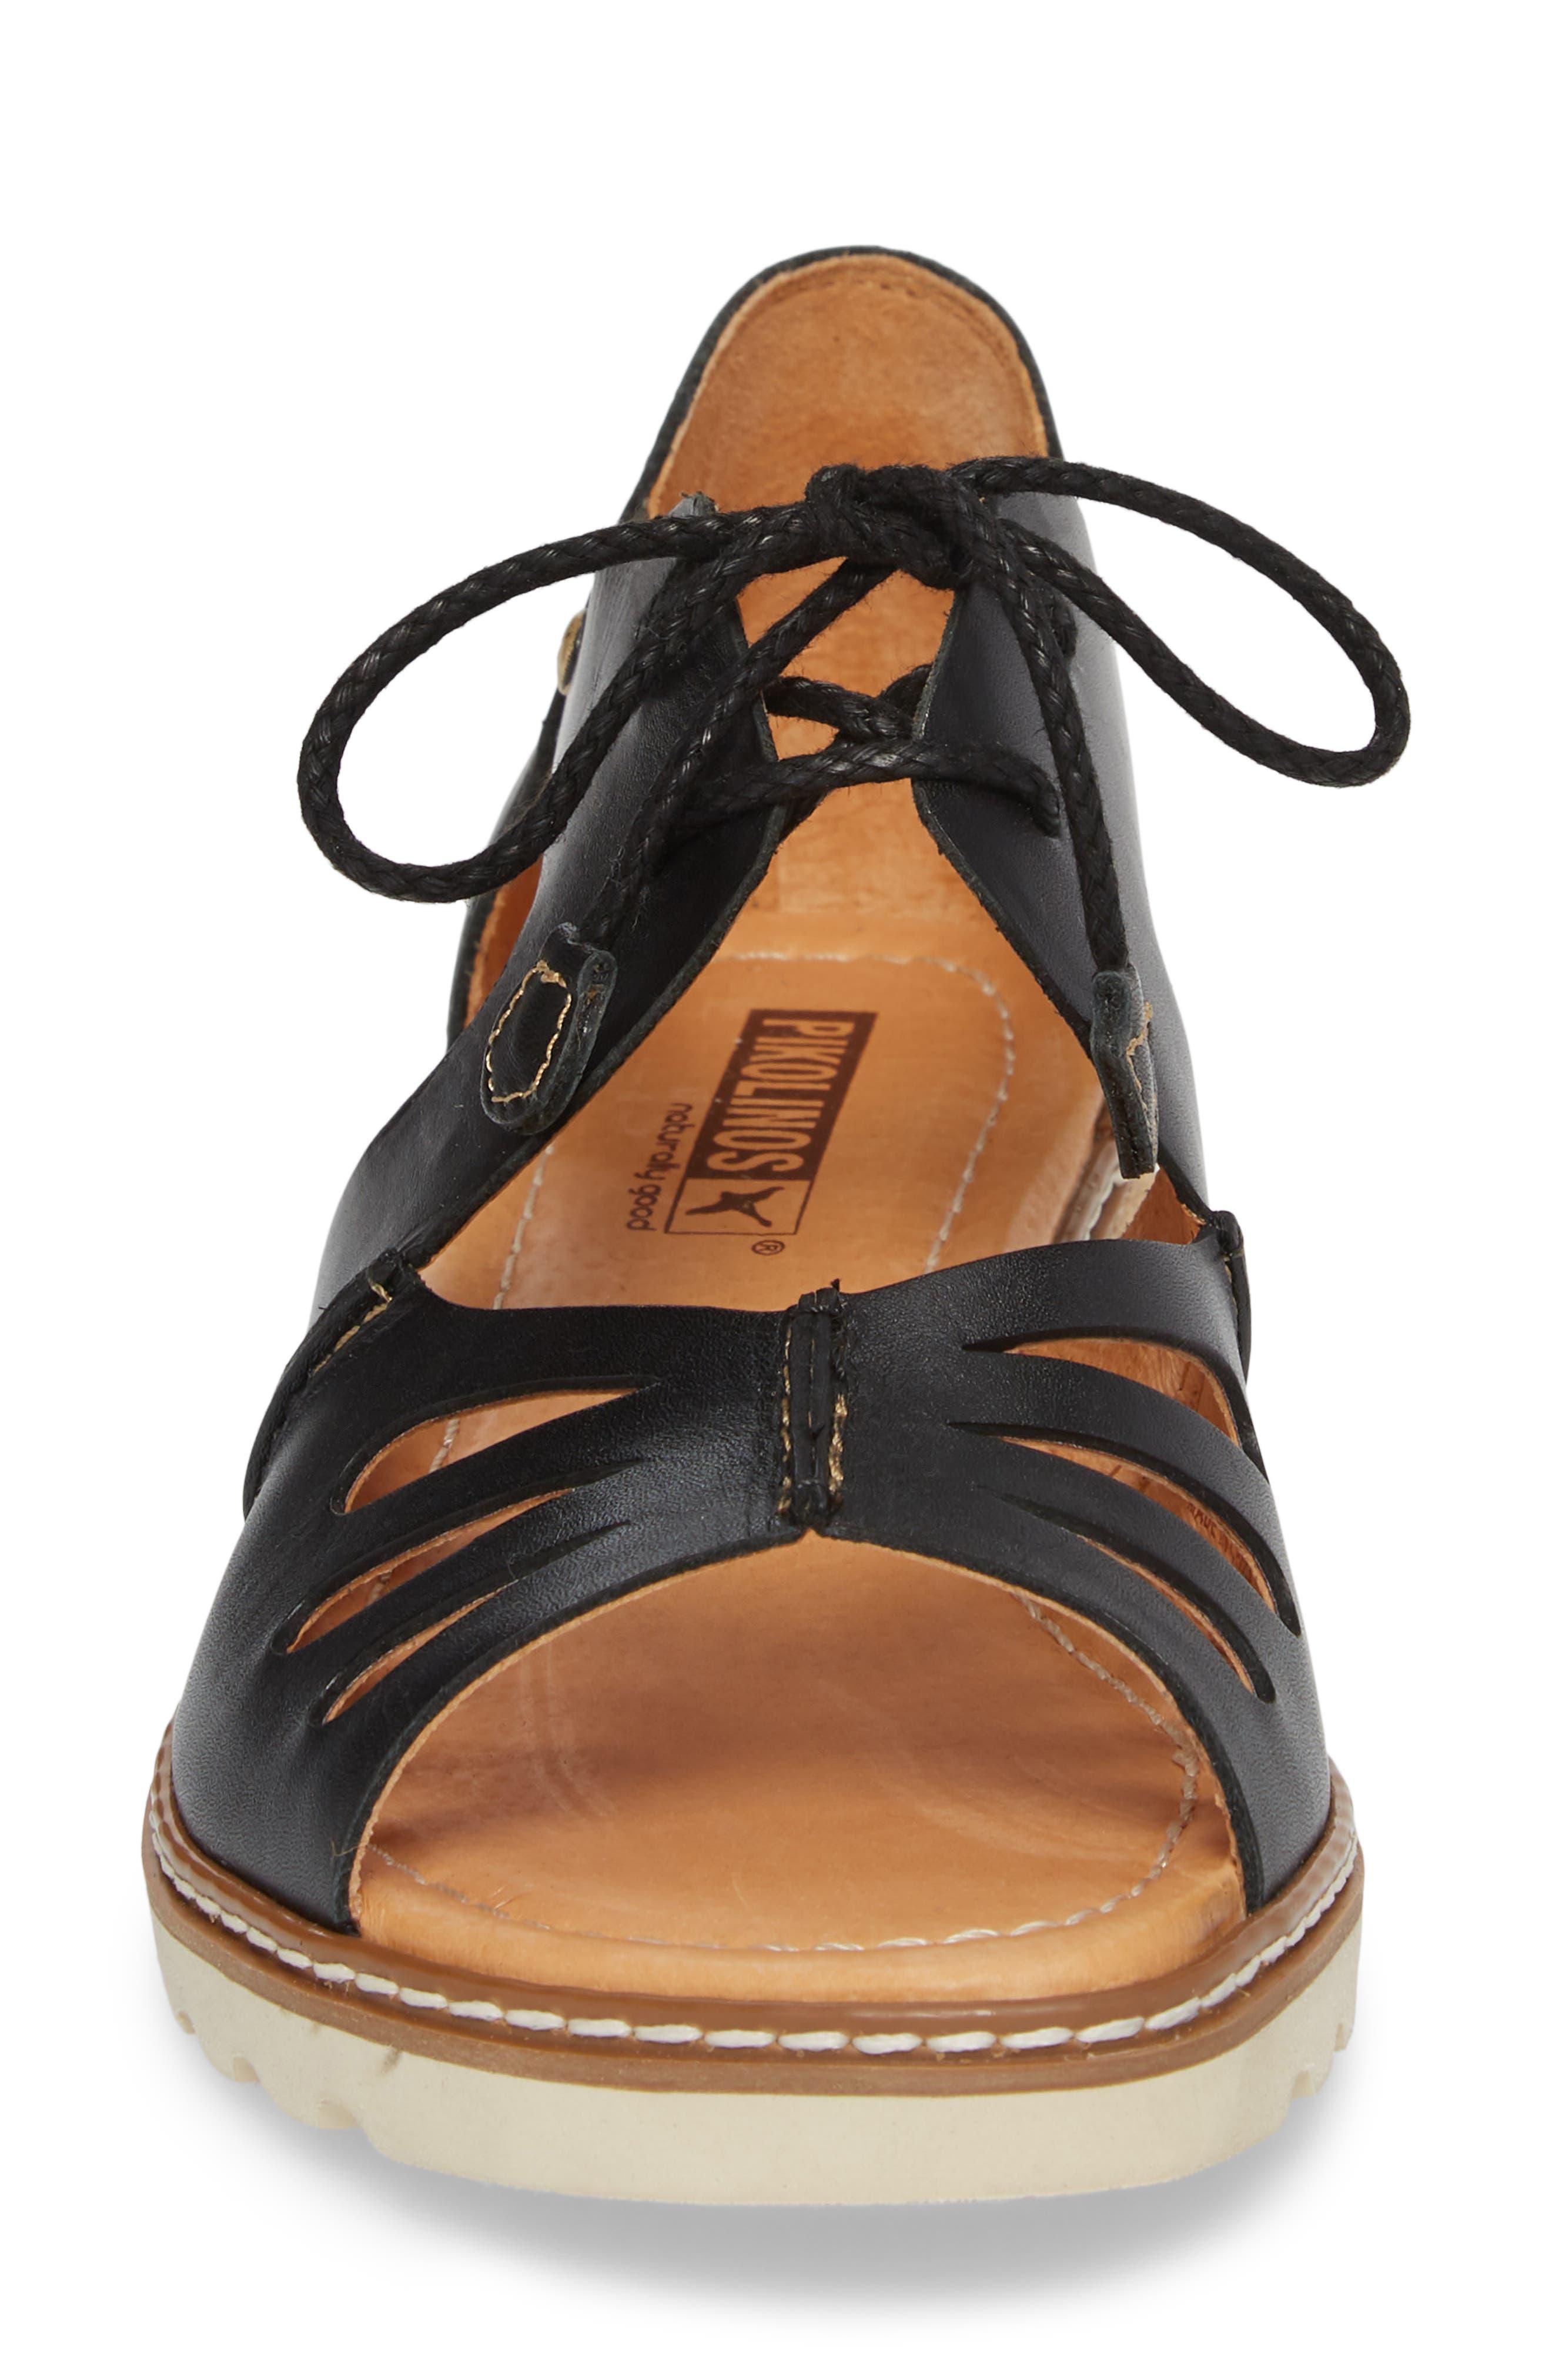 Alcudia Lace-Up Sandal,                             Alternate thumbnail 4, color,                             BLACK LEATHER